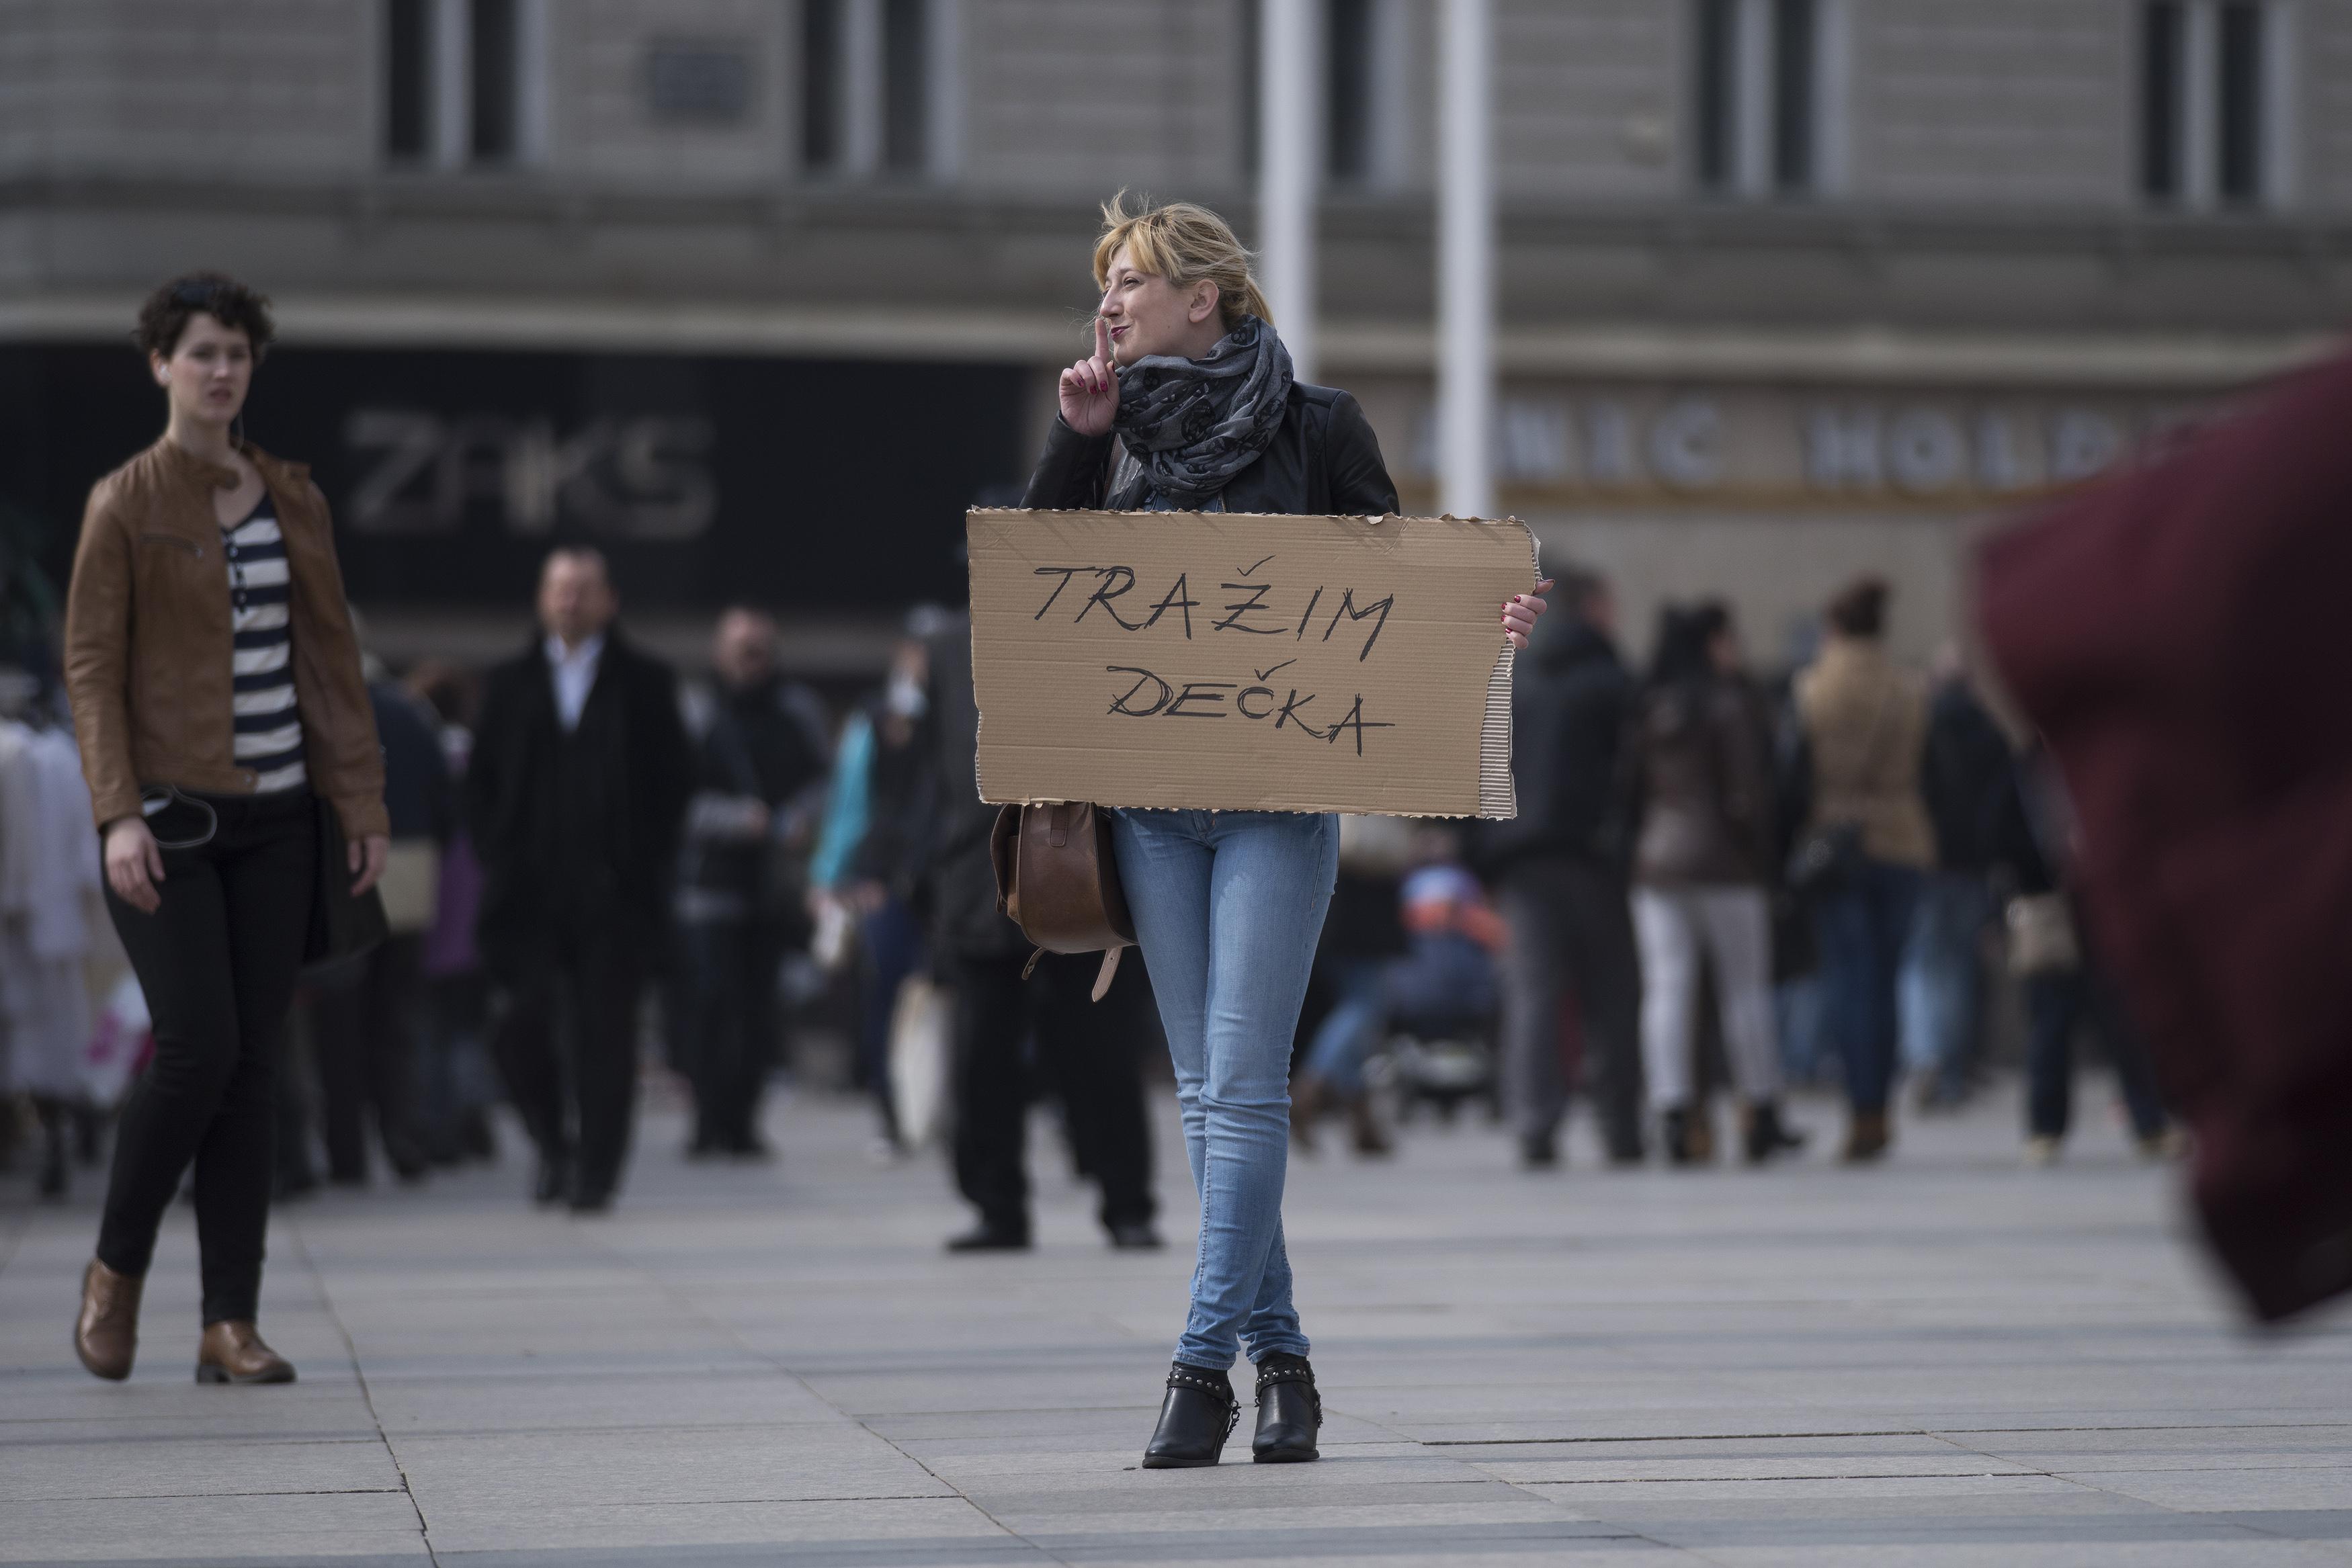 Zagreb decka trazim mladog Simpaticna dugonoga